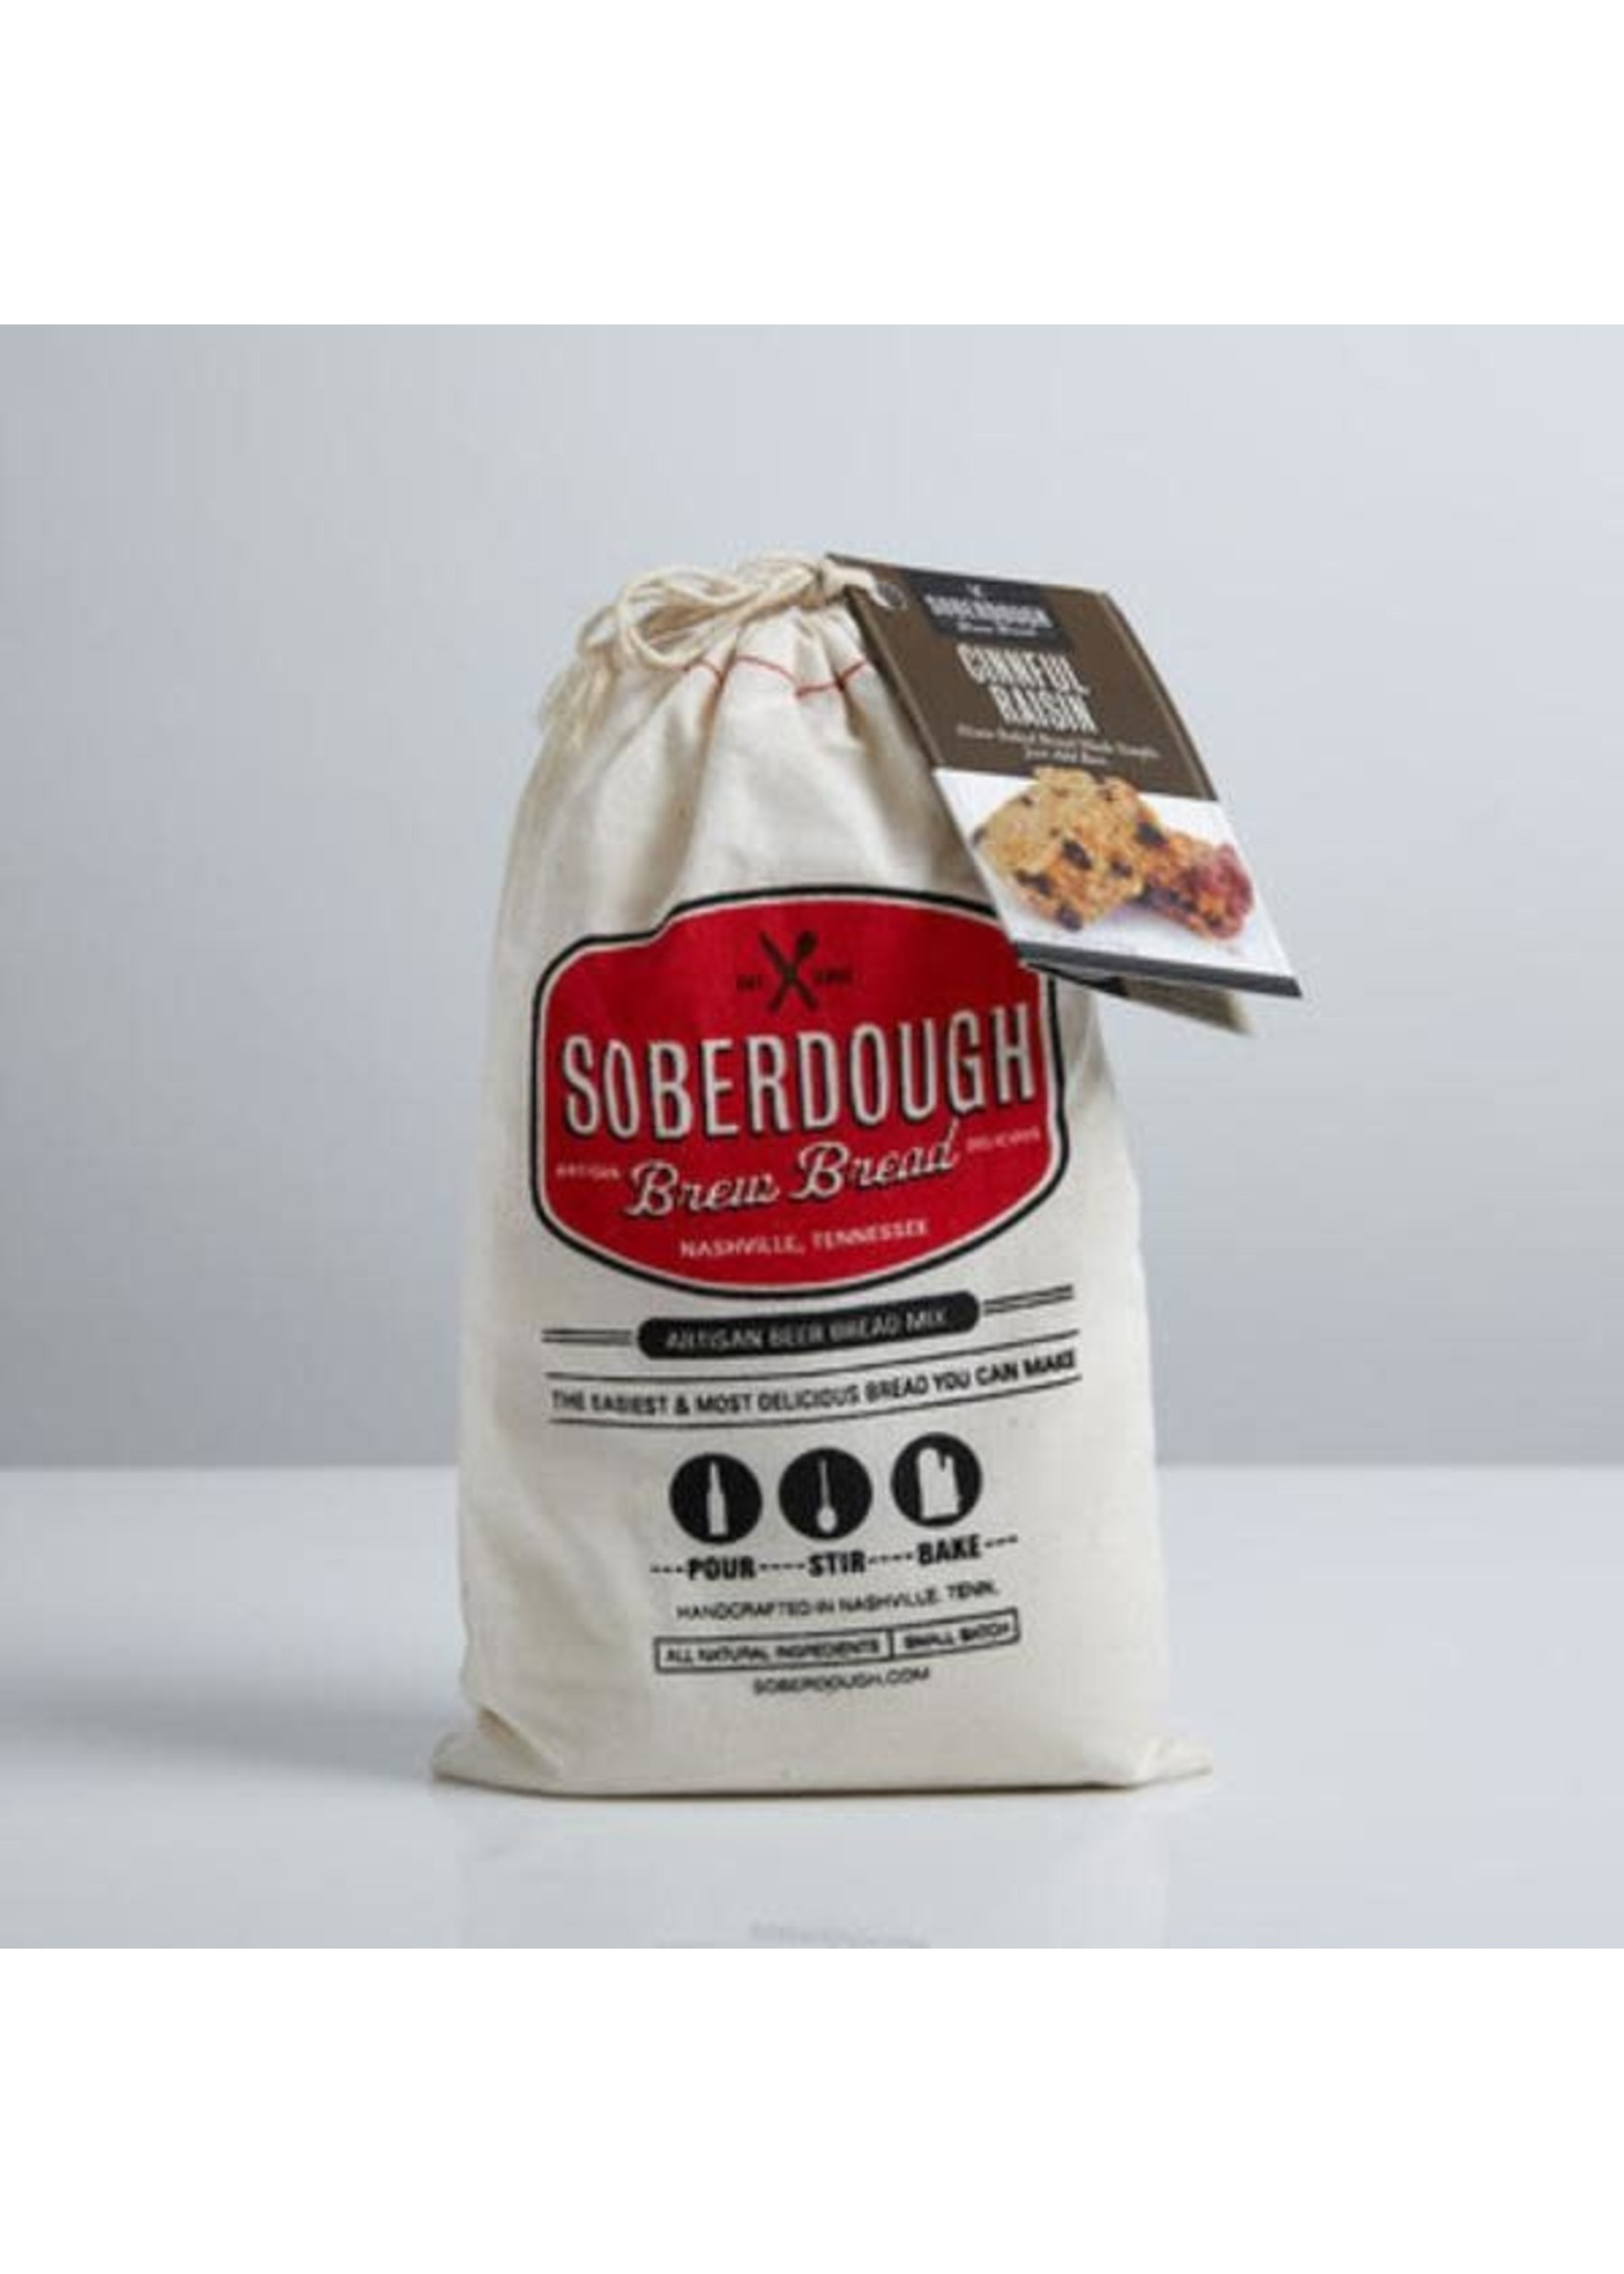 Soberdough Cinnful Raisin Beer Bread